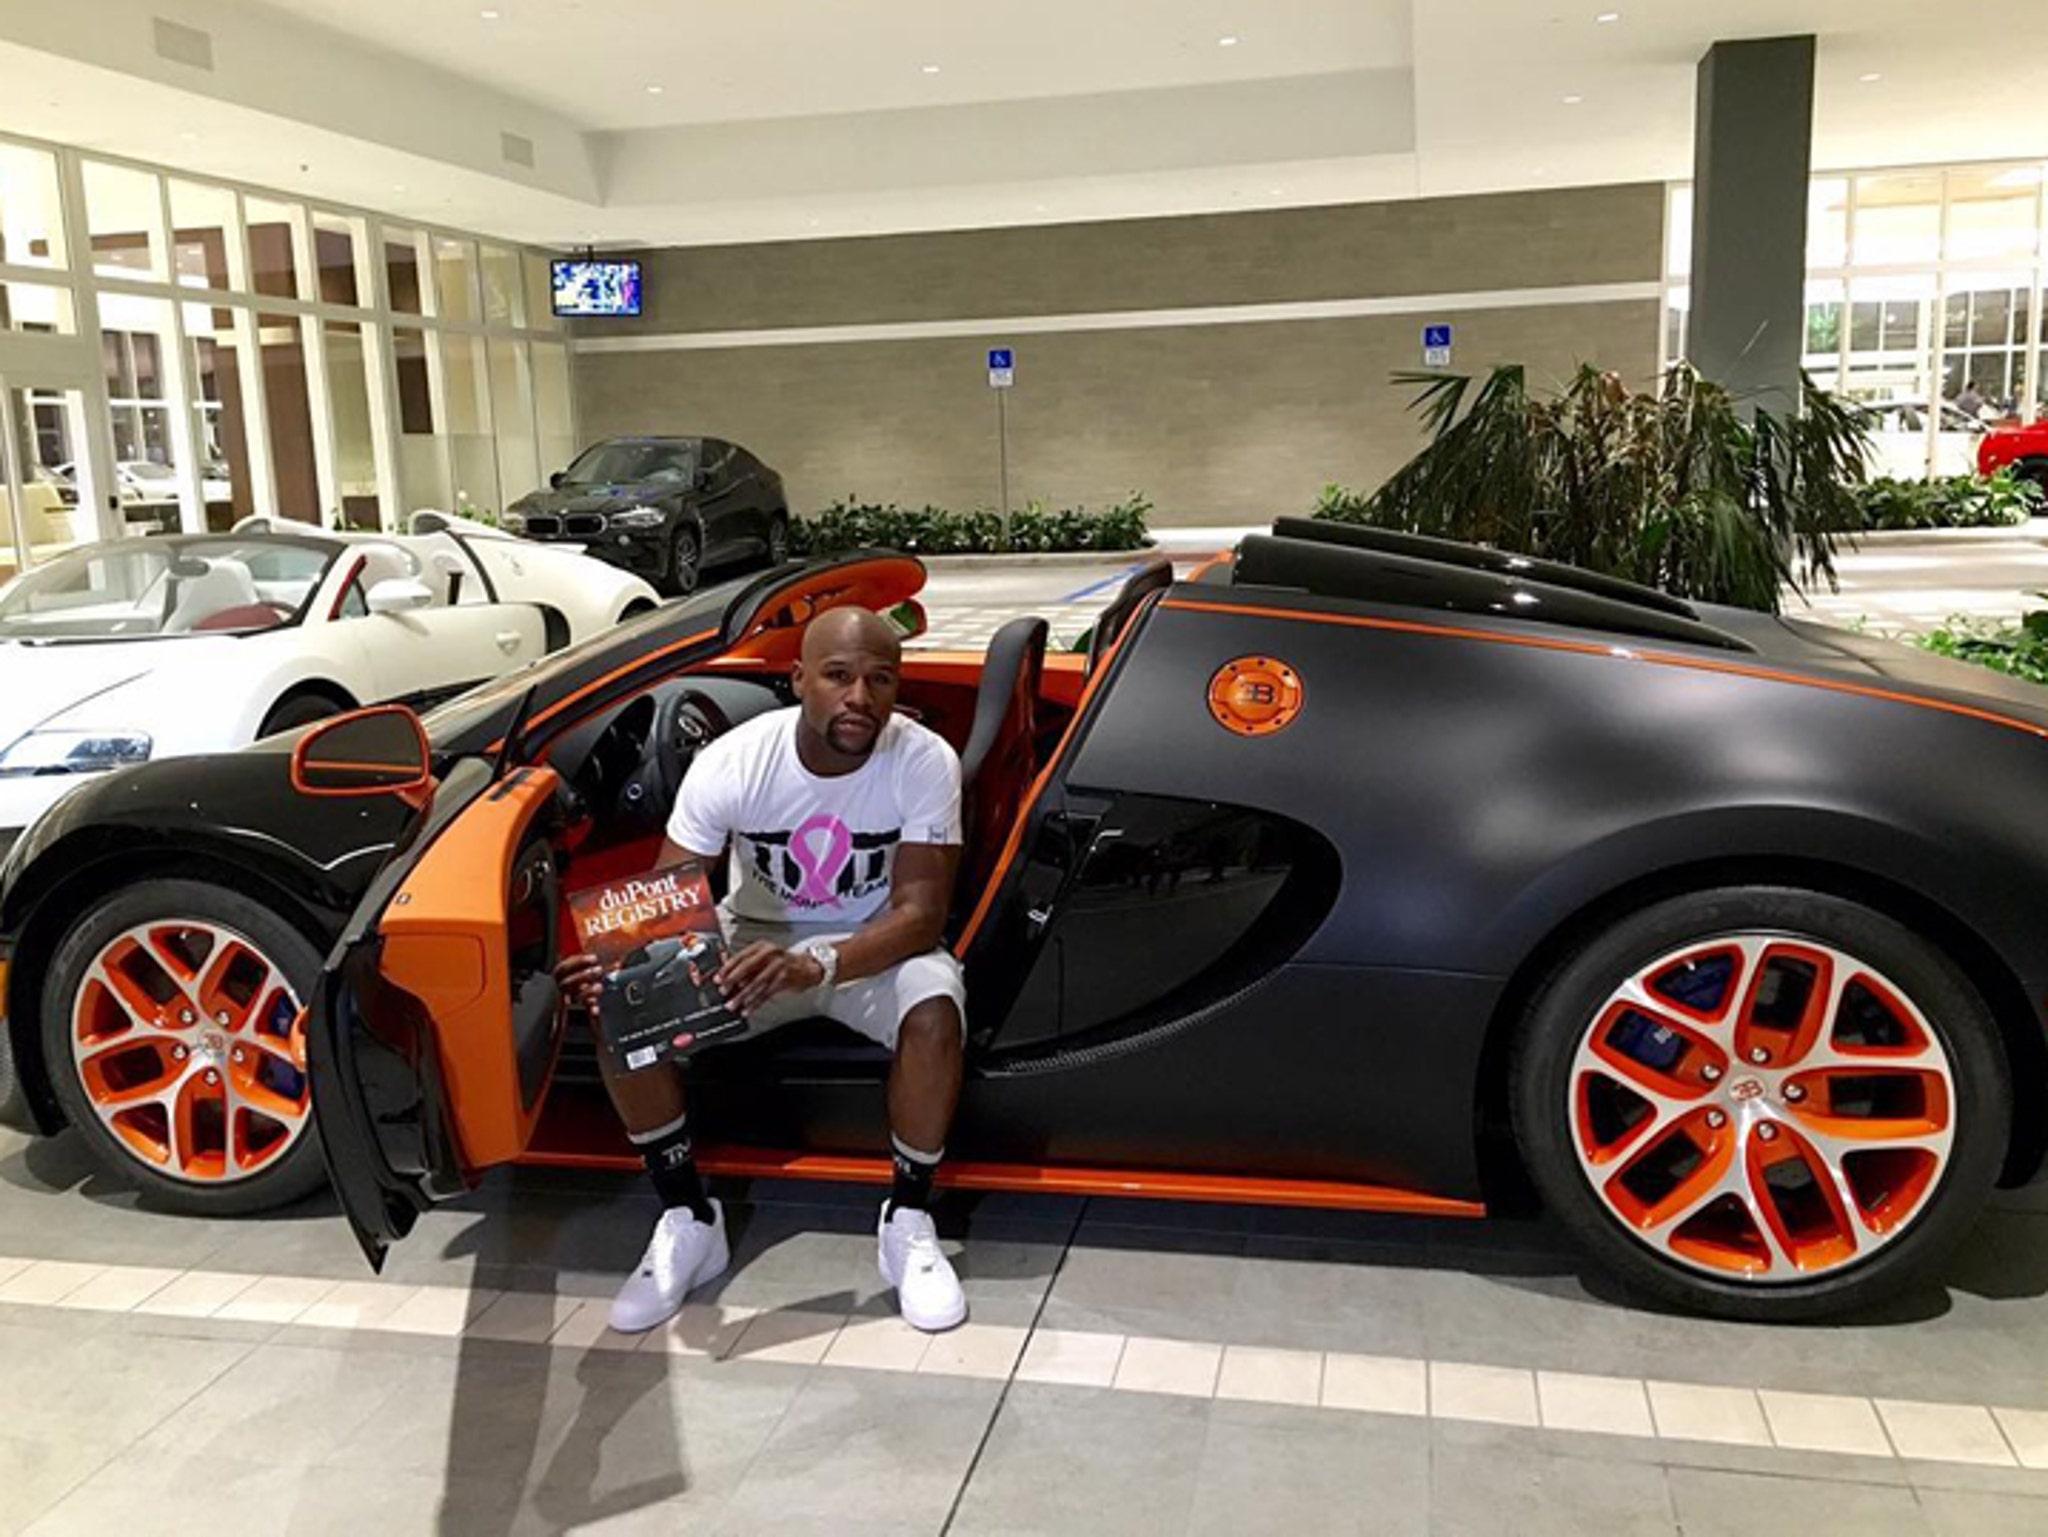 Bugattis For Sale >> Floyd Mayweather S Bugatti For Sale With 3 95 Million Price